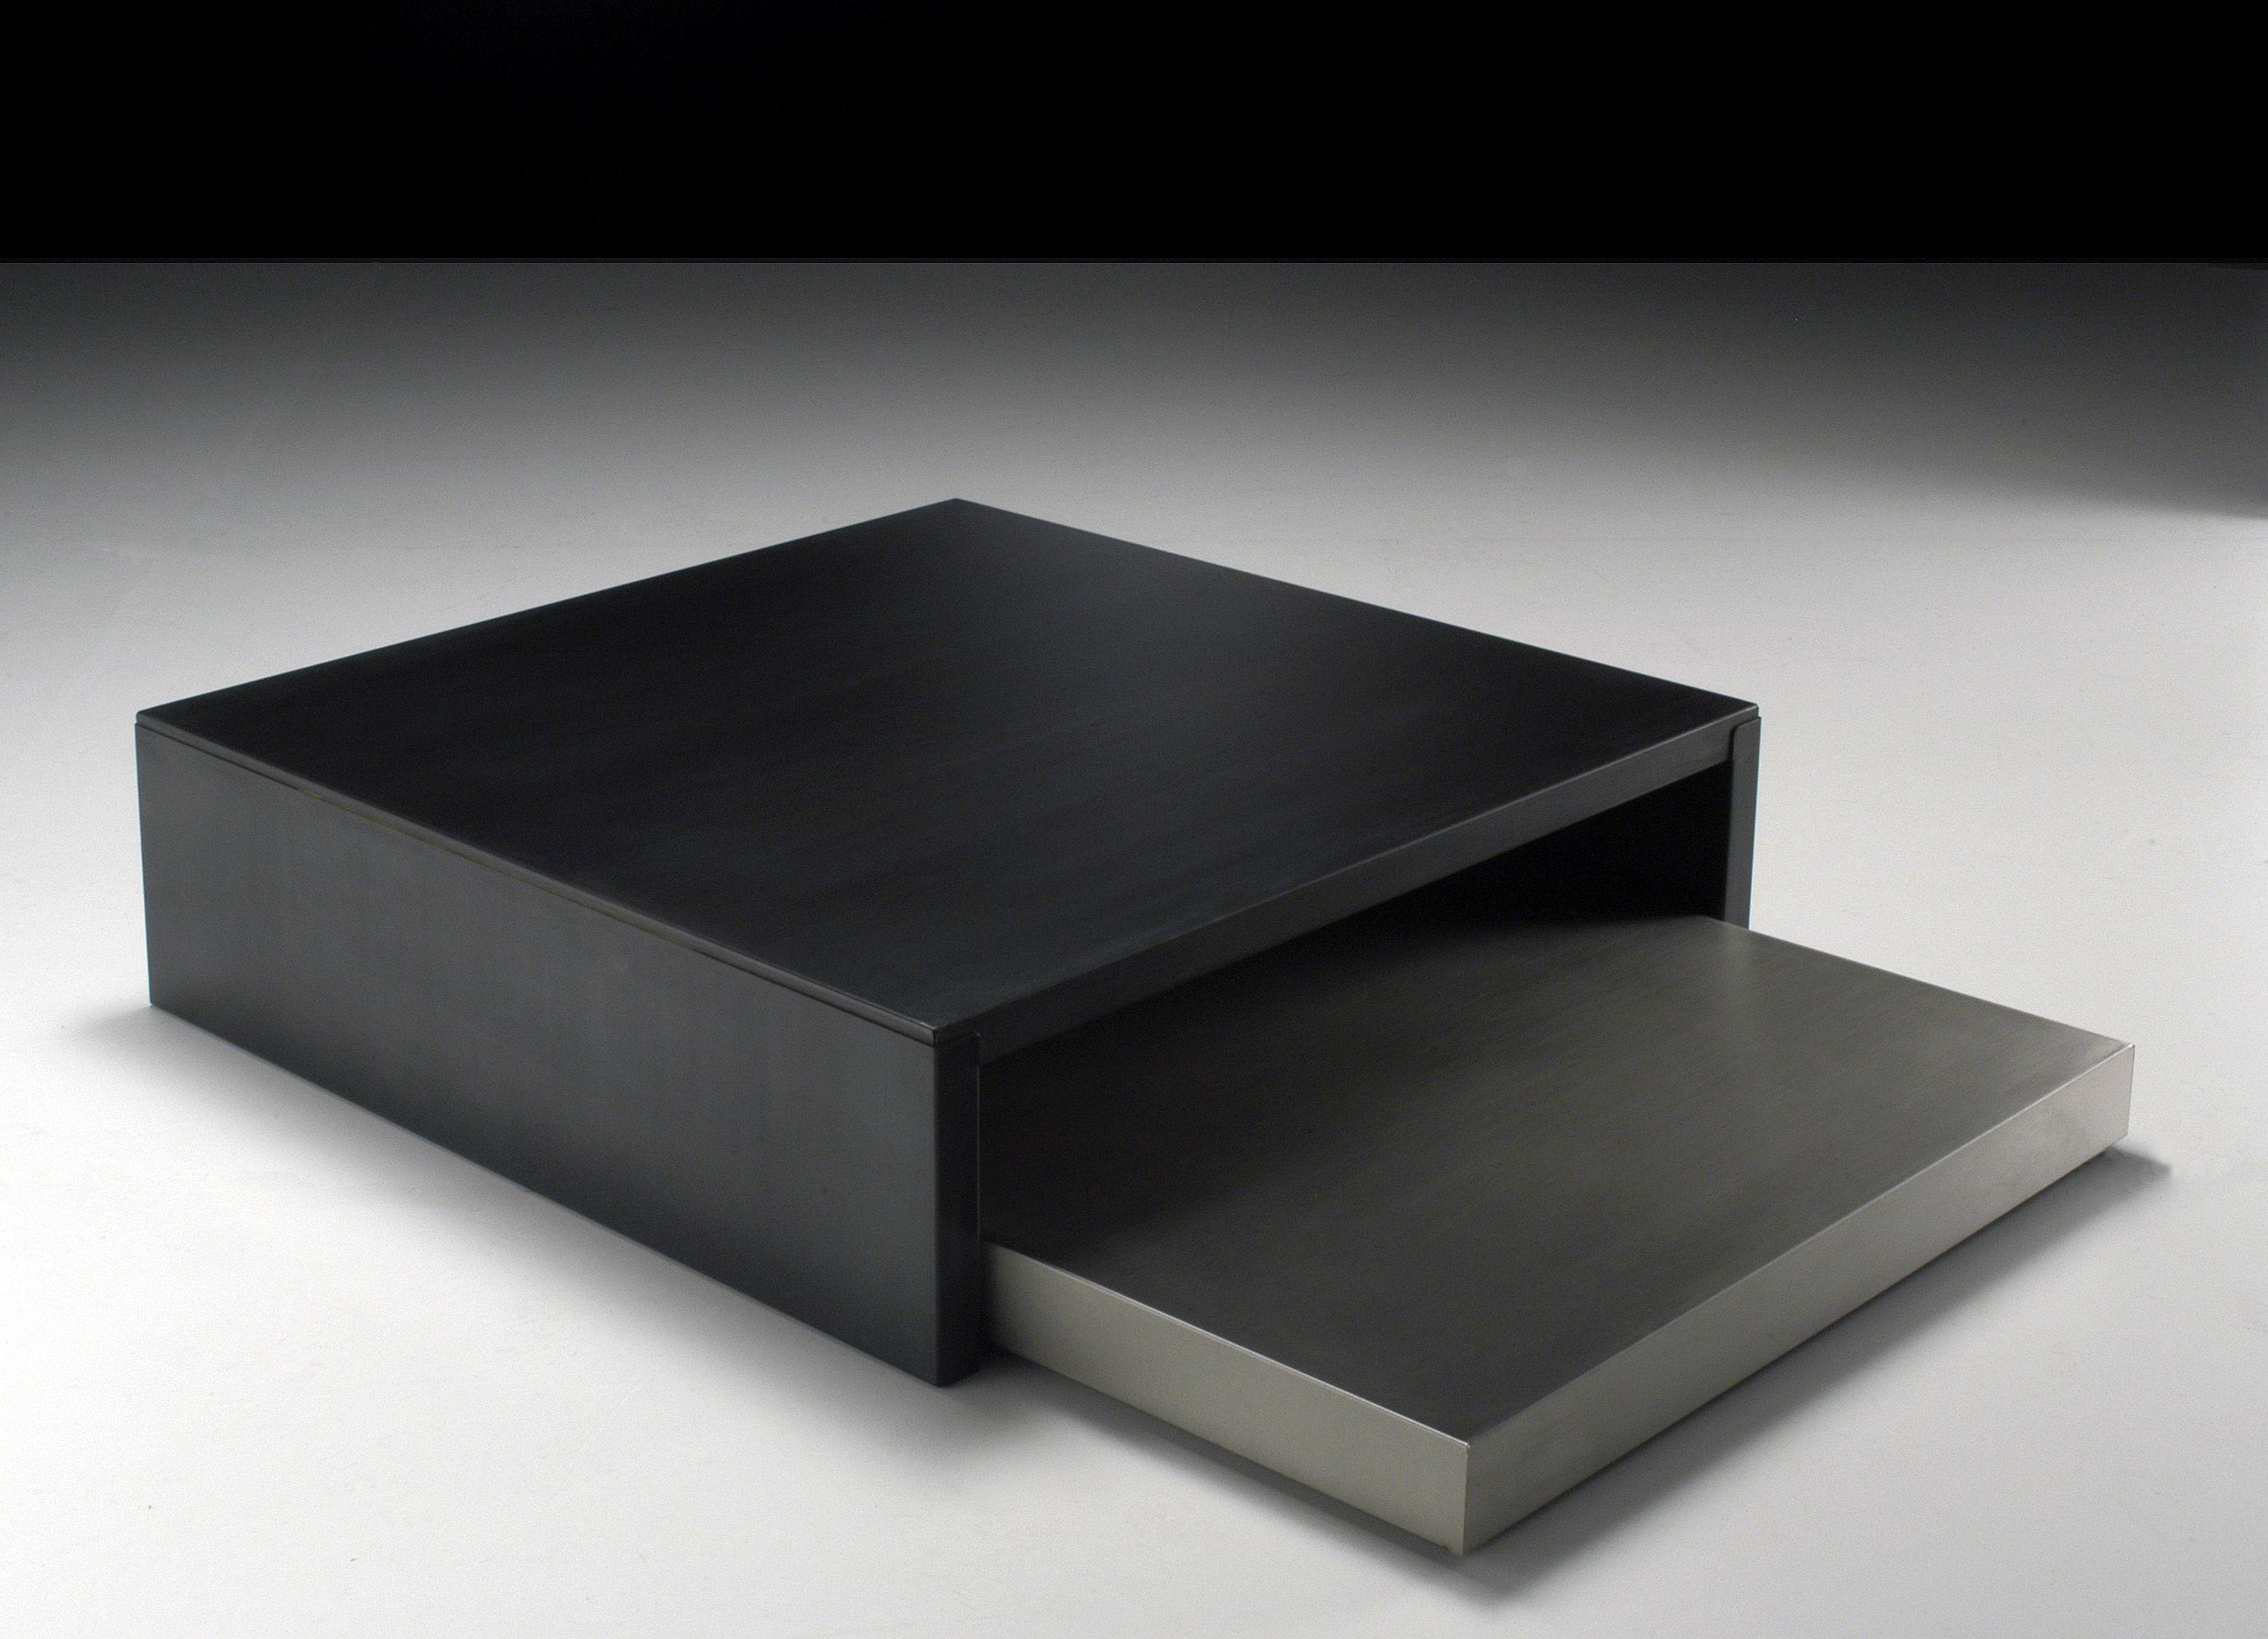 Table basse max moritz acier phosphat noir acier - Table basse acier noir ...